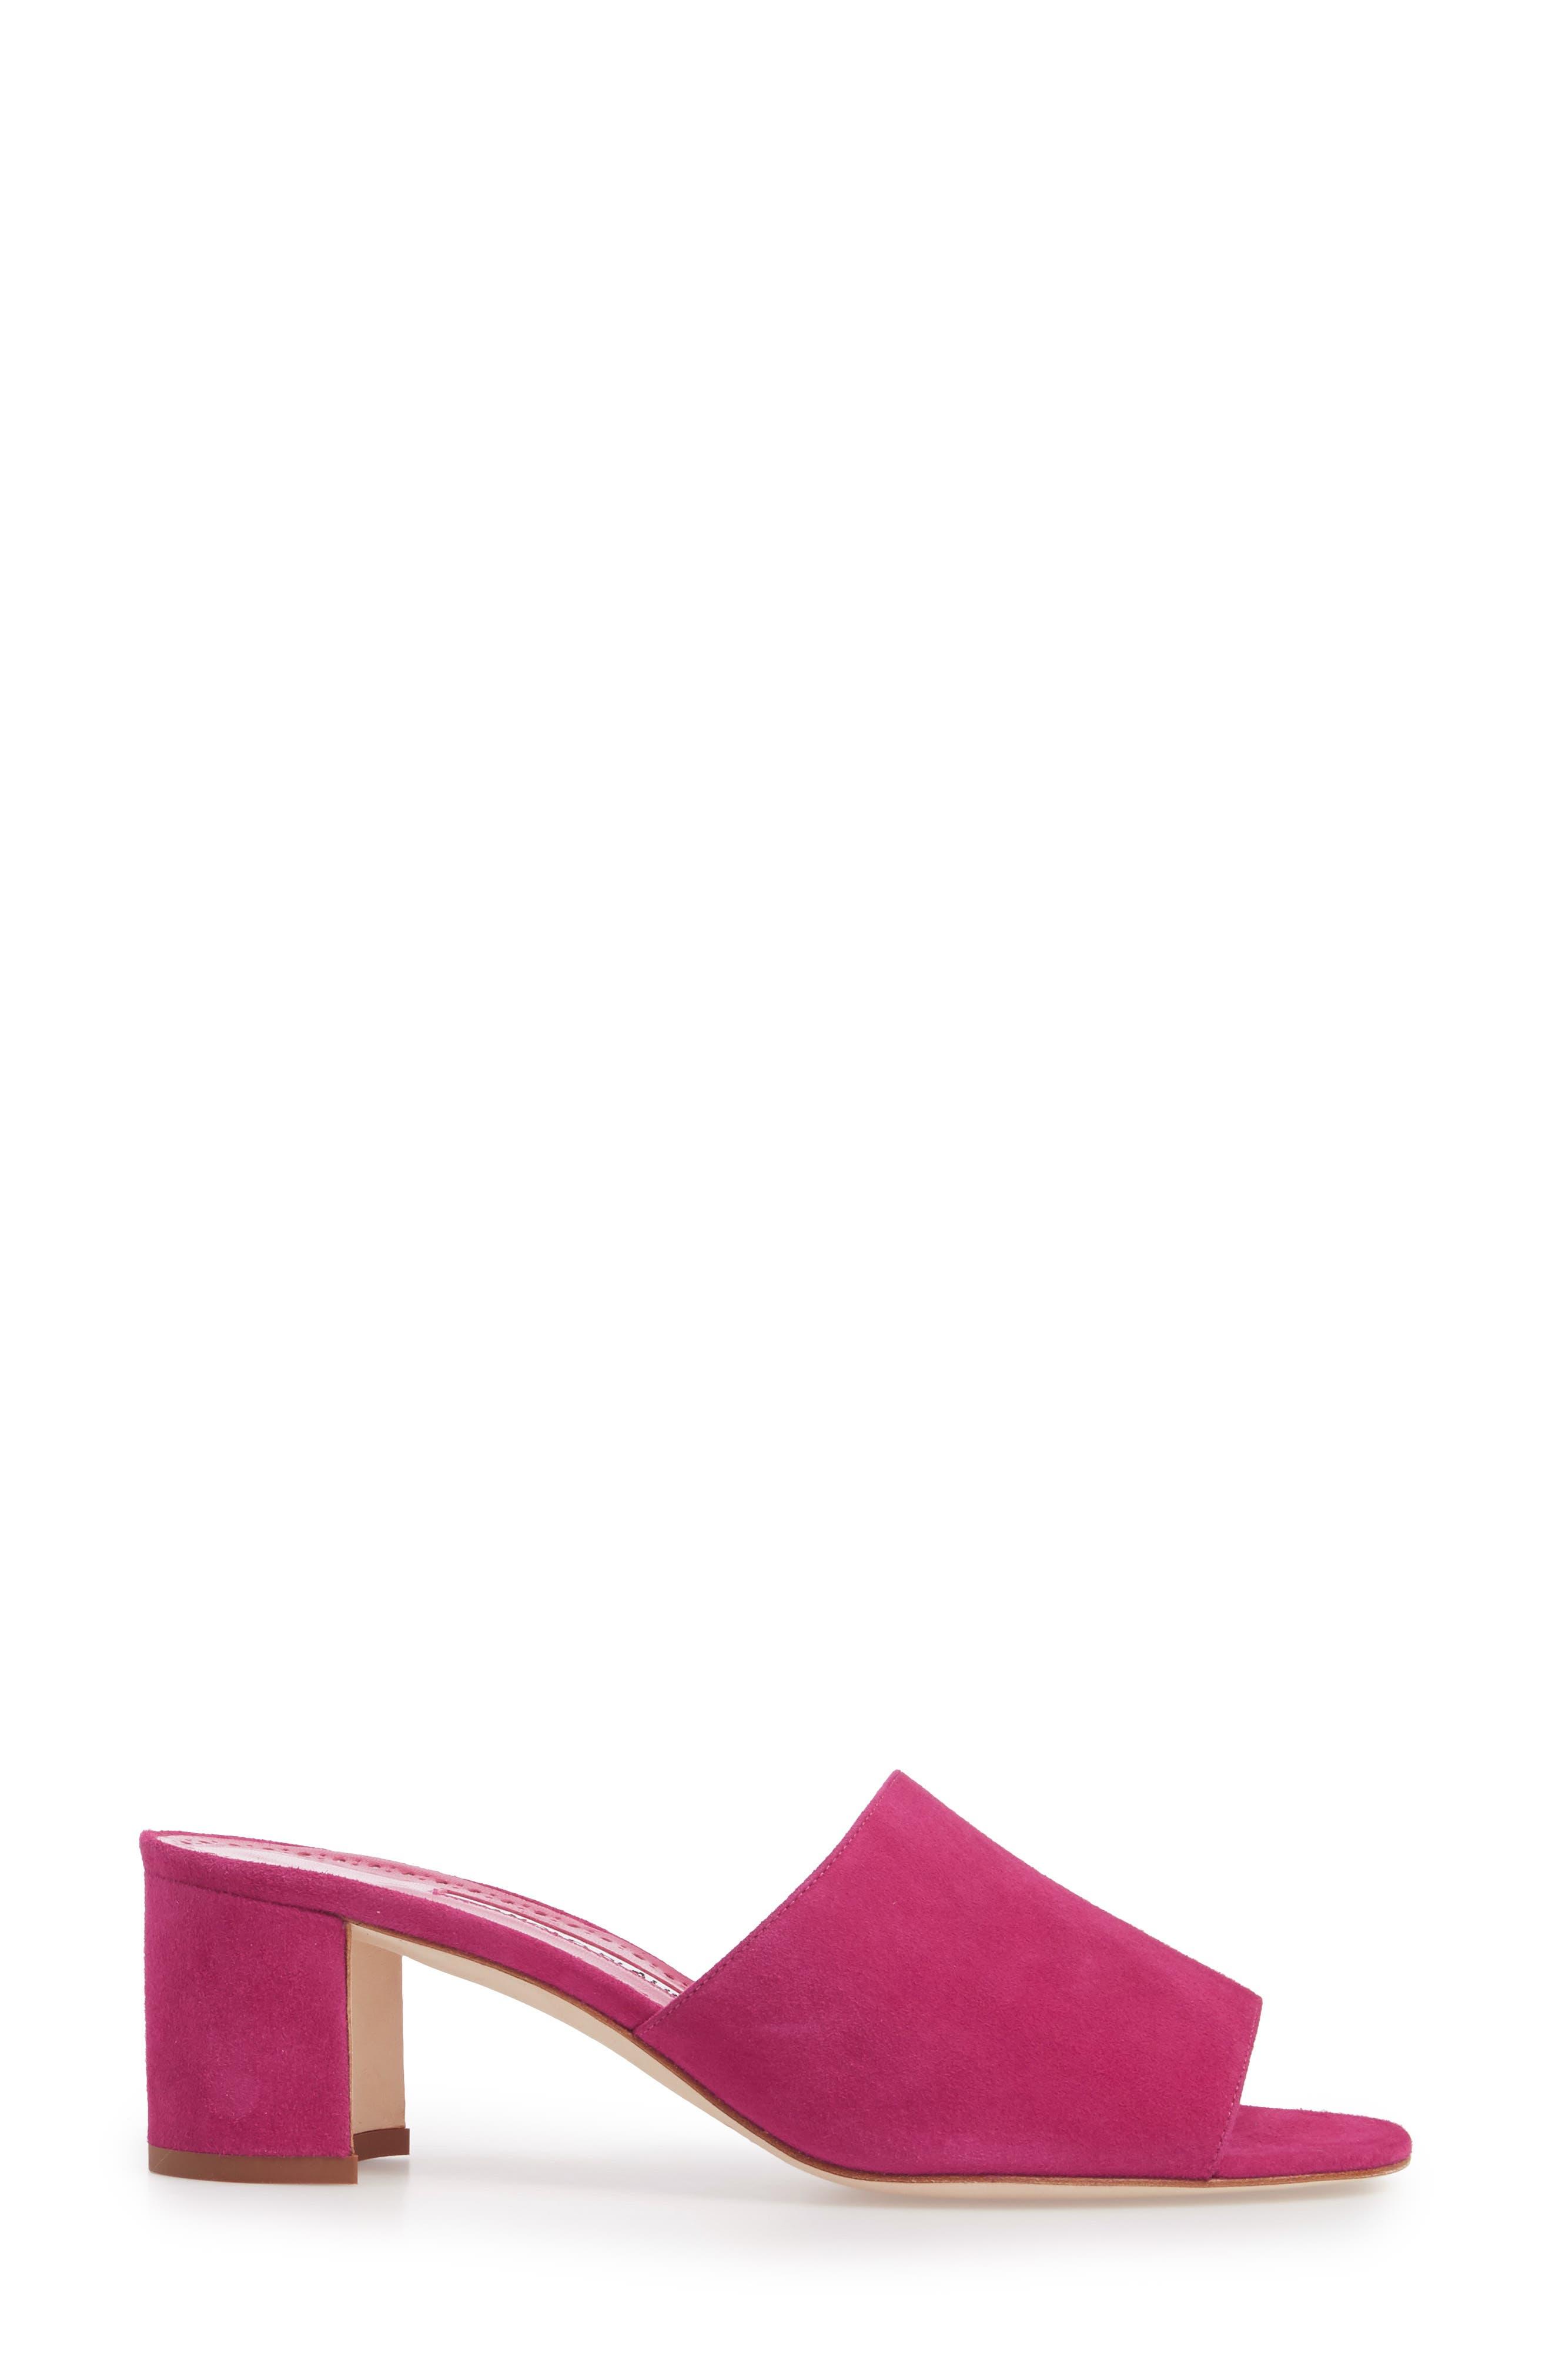 Rapallato Slide Sandal,                             Alternate thumbnail 3, color,                             Fuchsia Suede